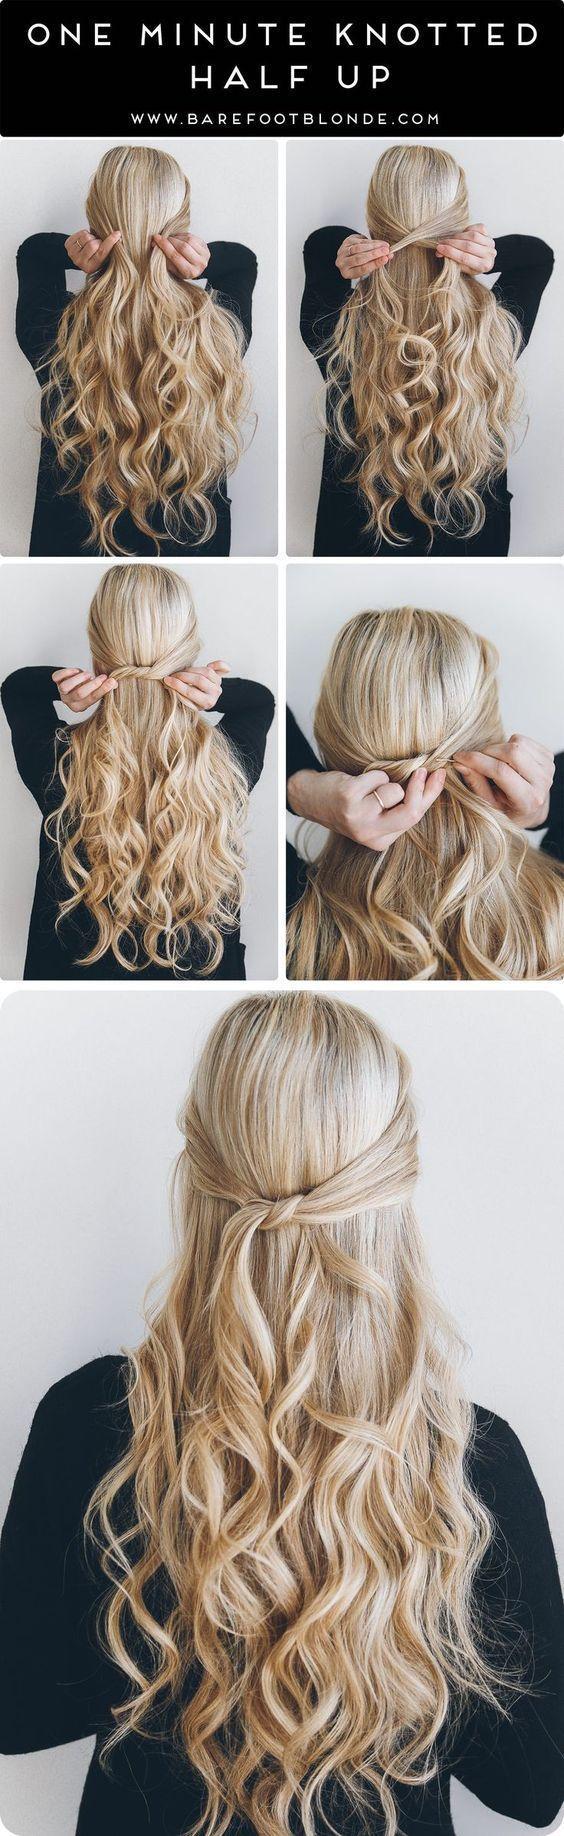 popular hairstyles ideas